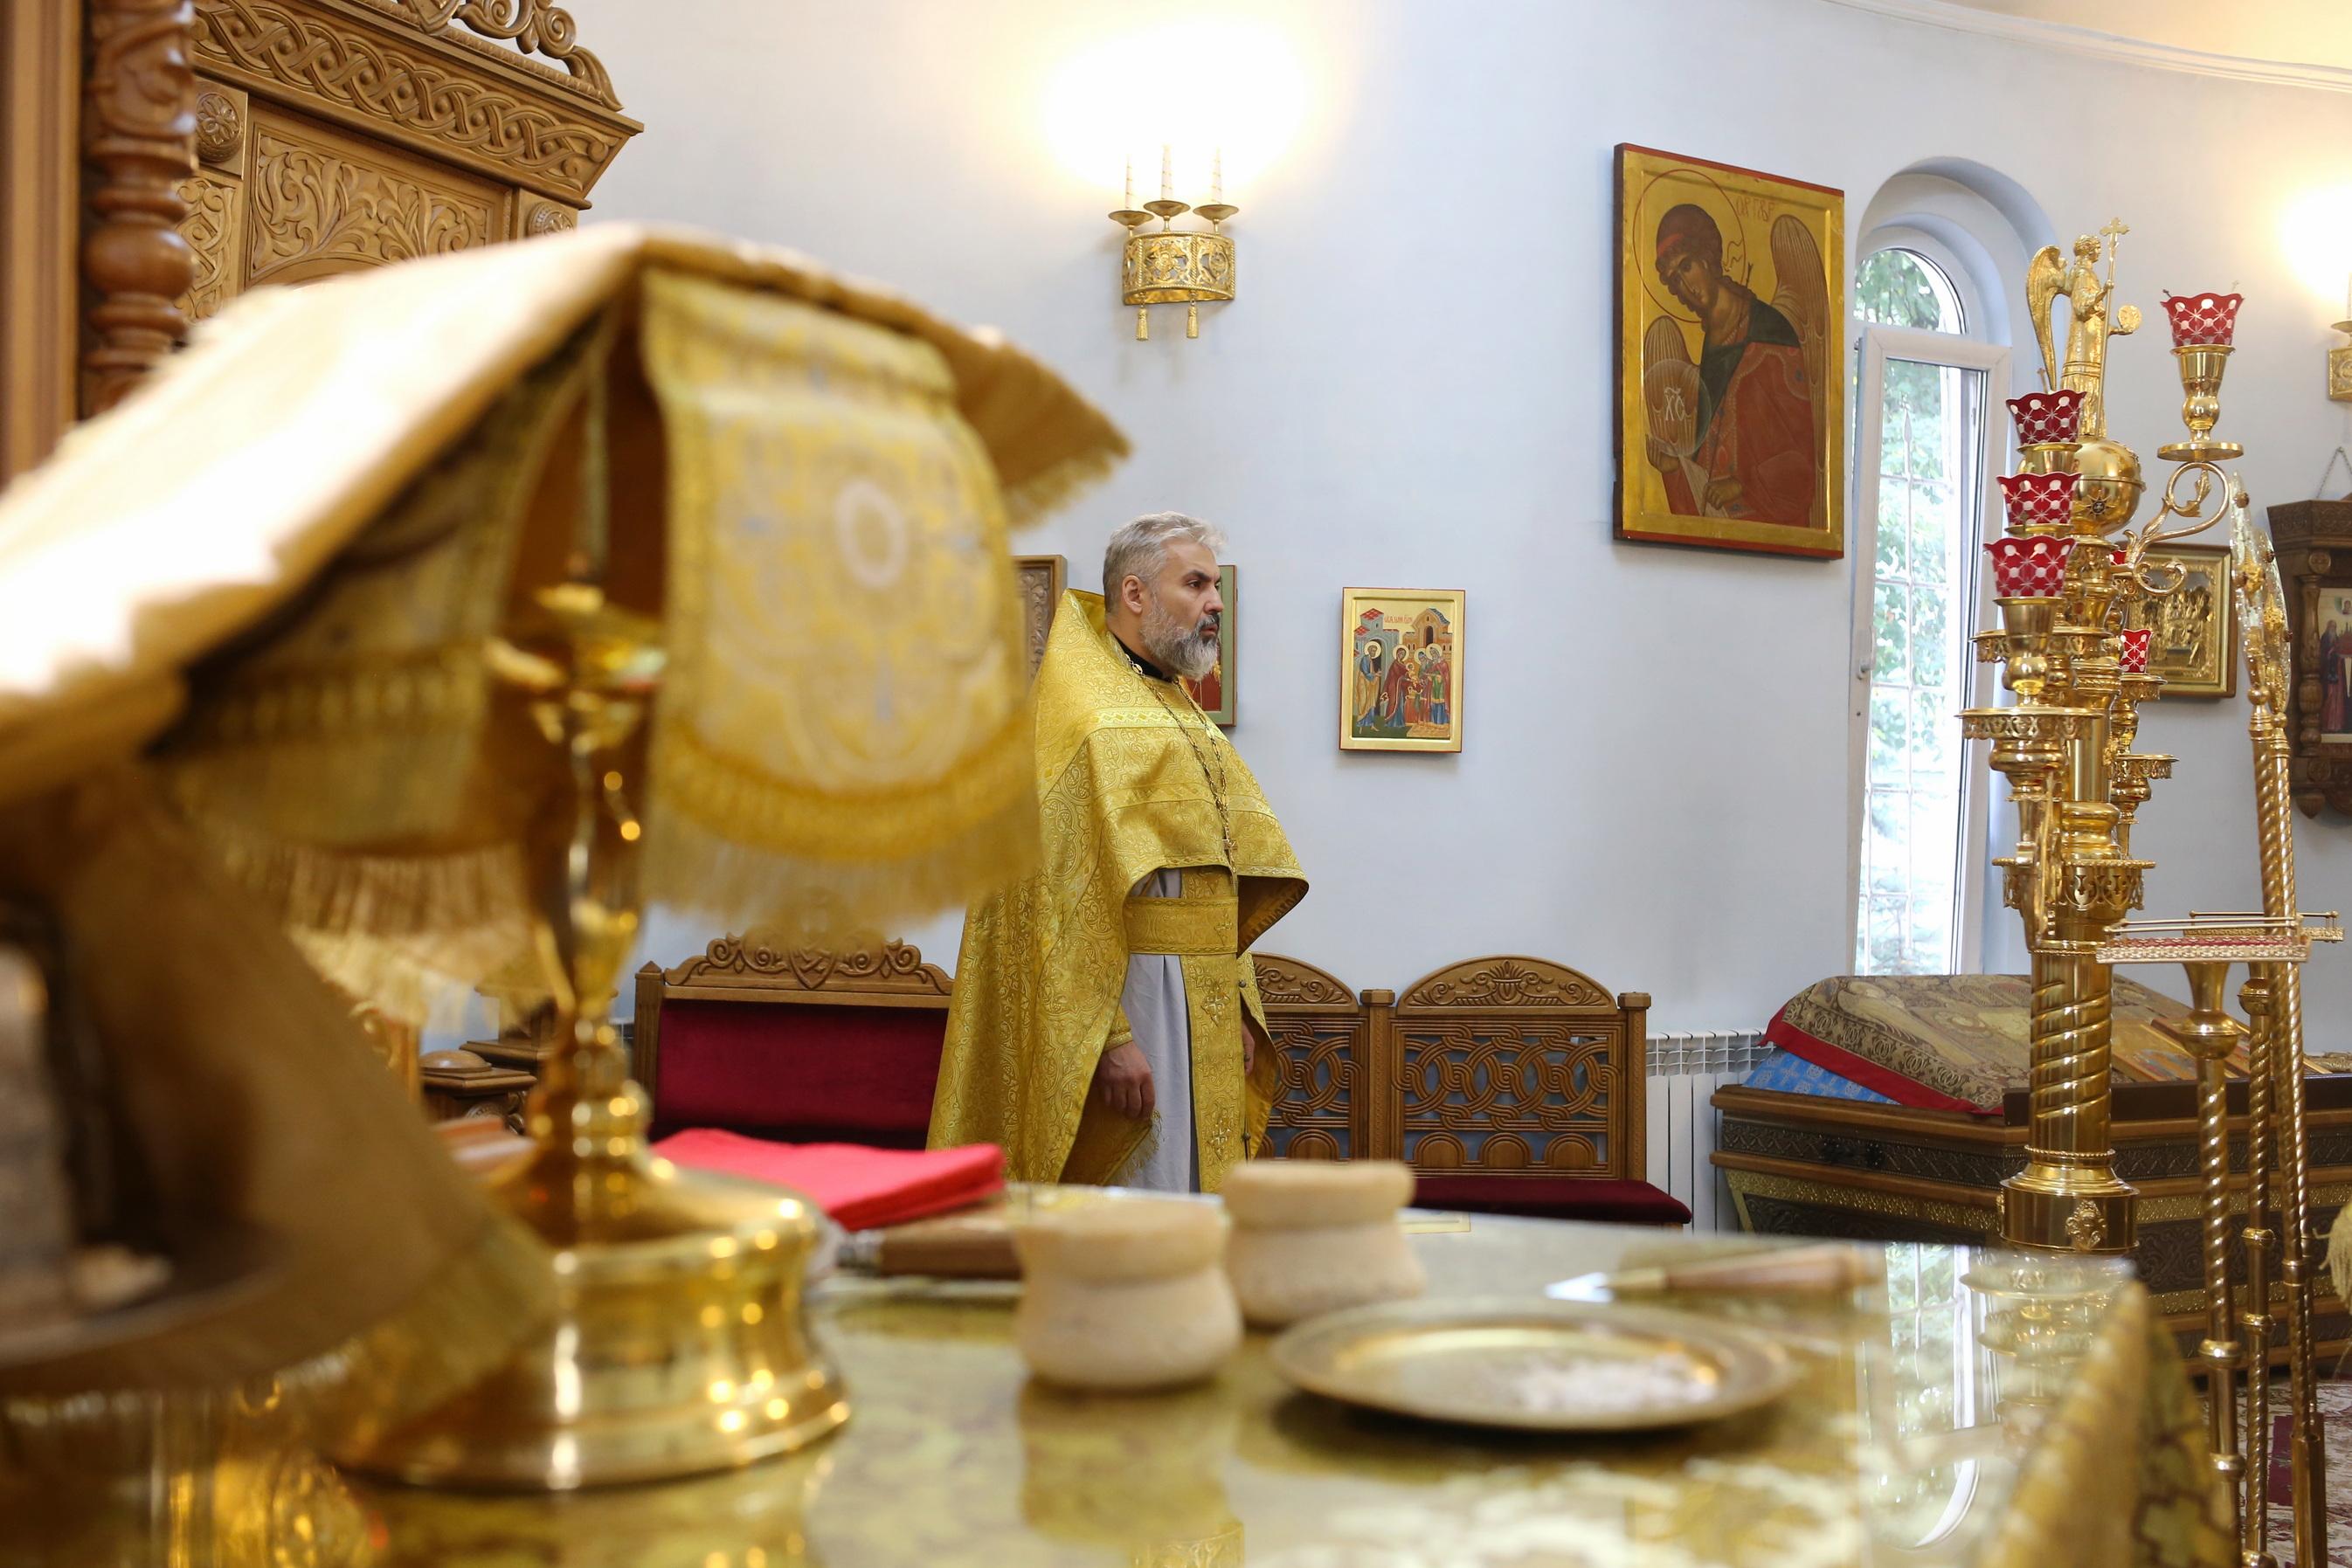 http://monuspen.ru/photoreports/f2e5a059402e90a712d6c1b56b00833k.JPG